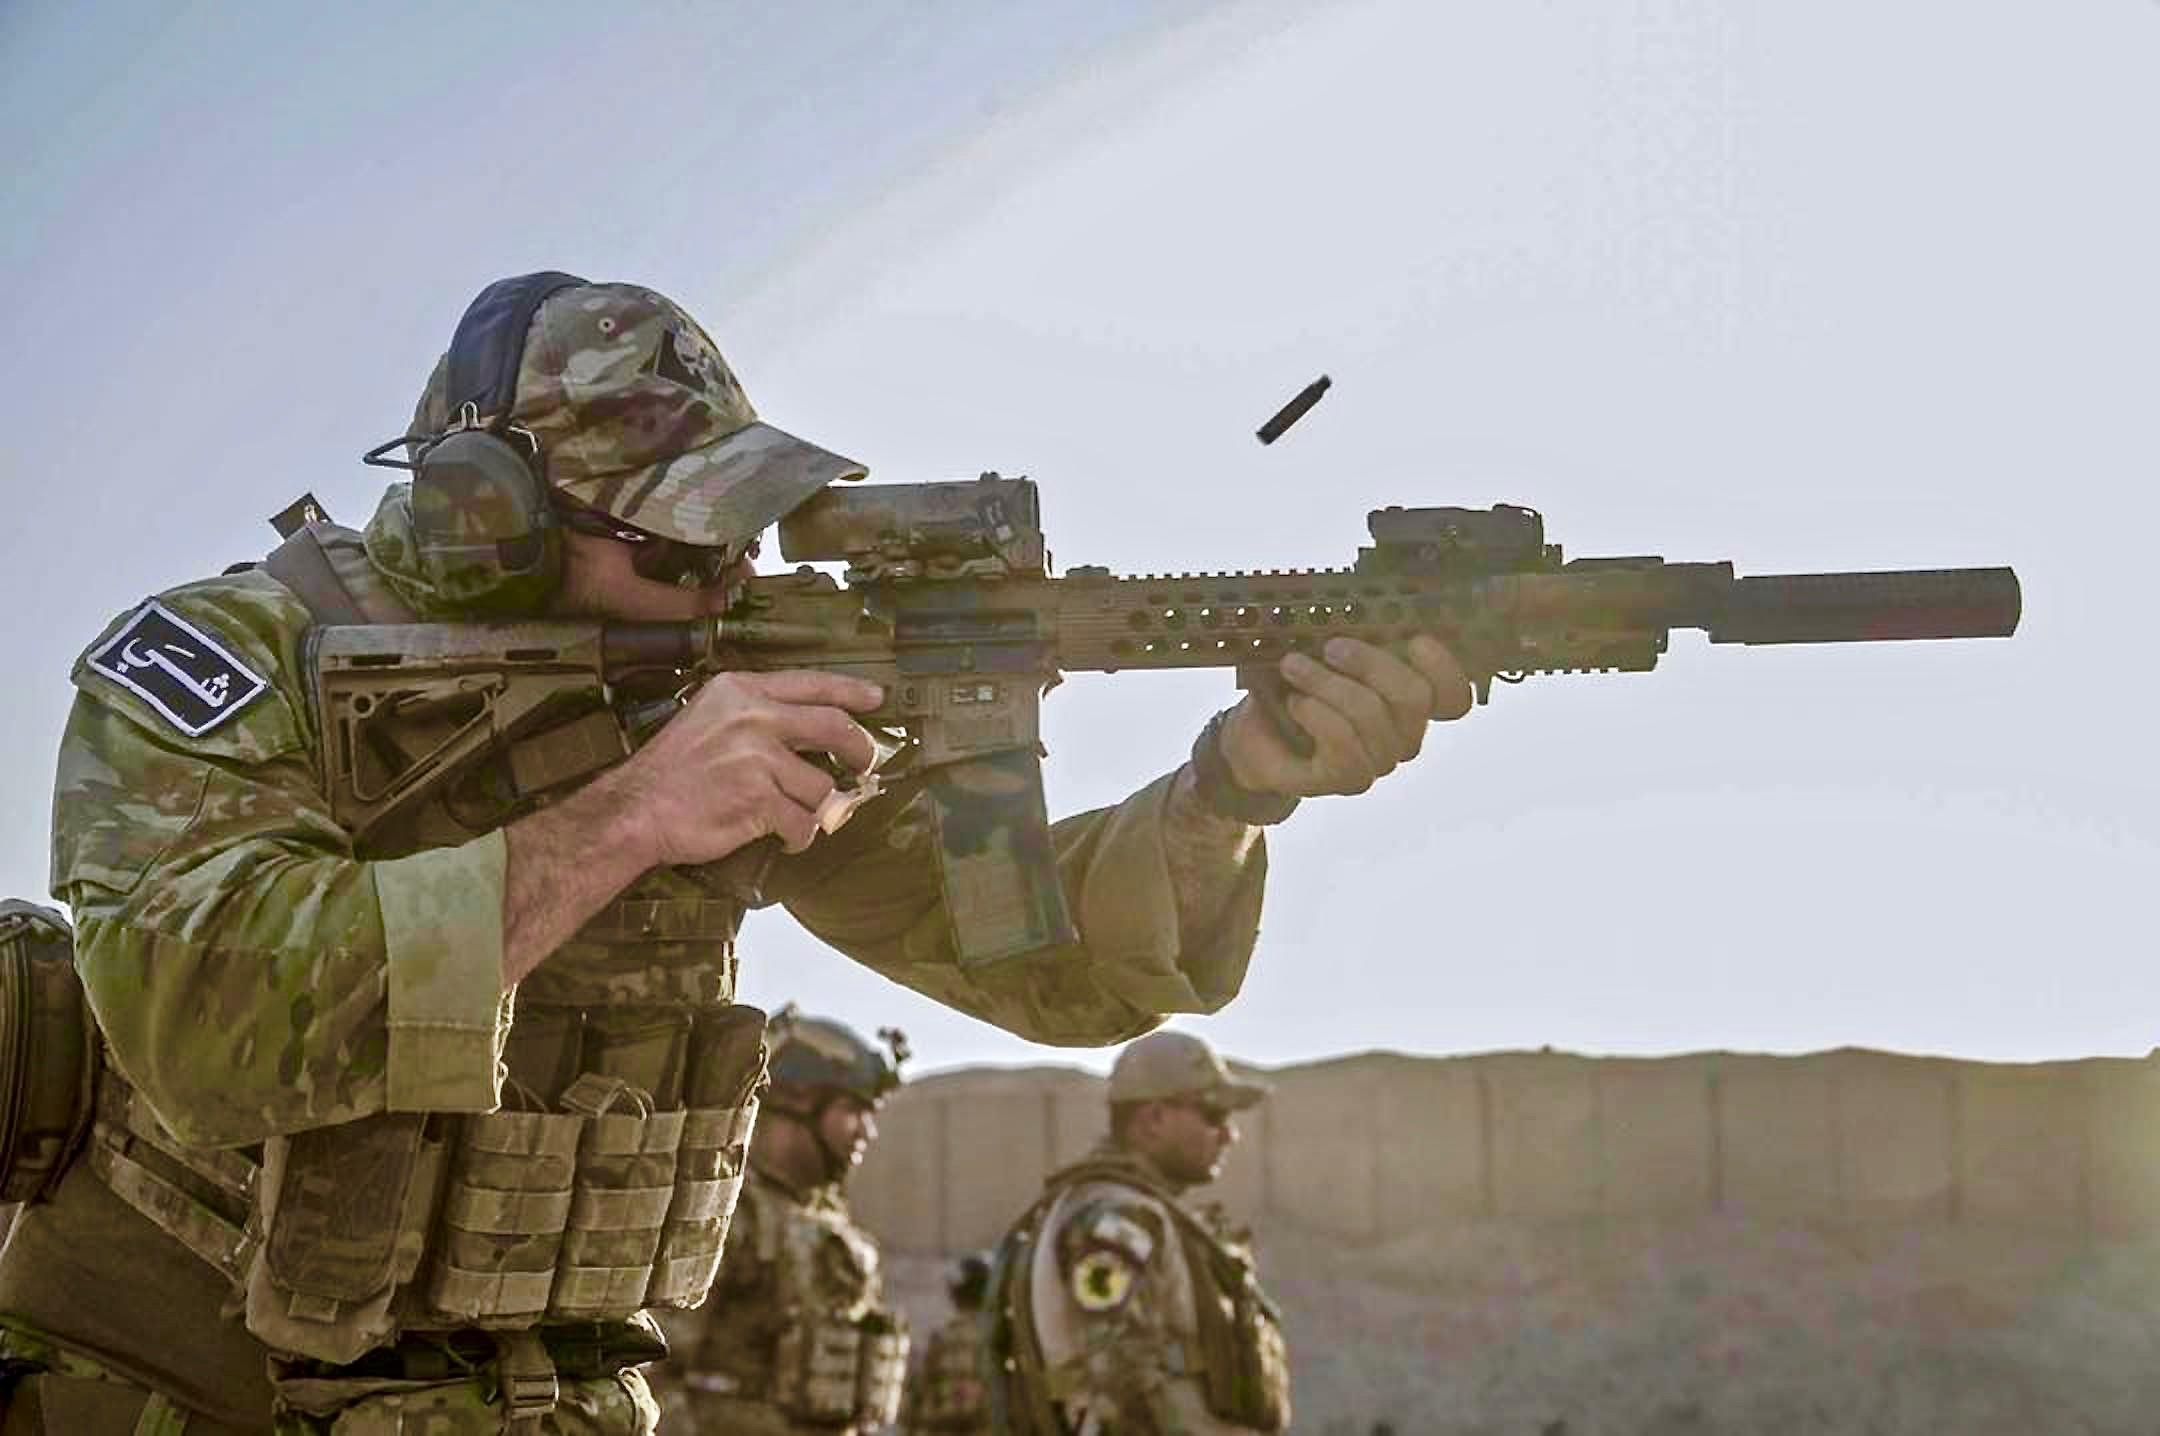 Ozzie S 2nd Commando Regiment D Company 21601436 Special Forces Army Special Forces Military Special Forces